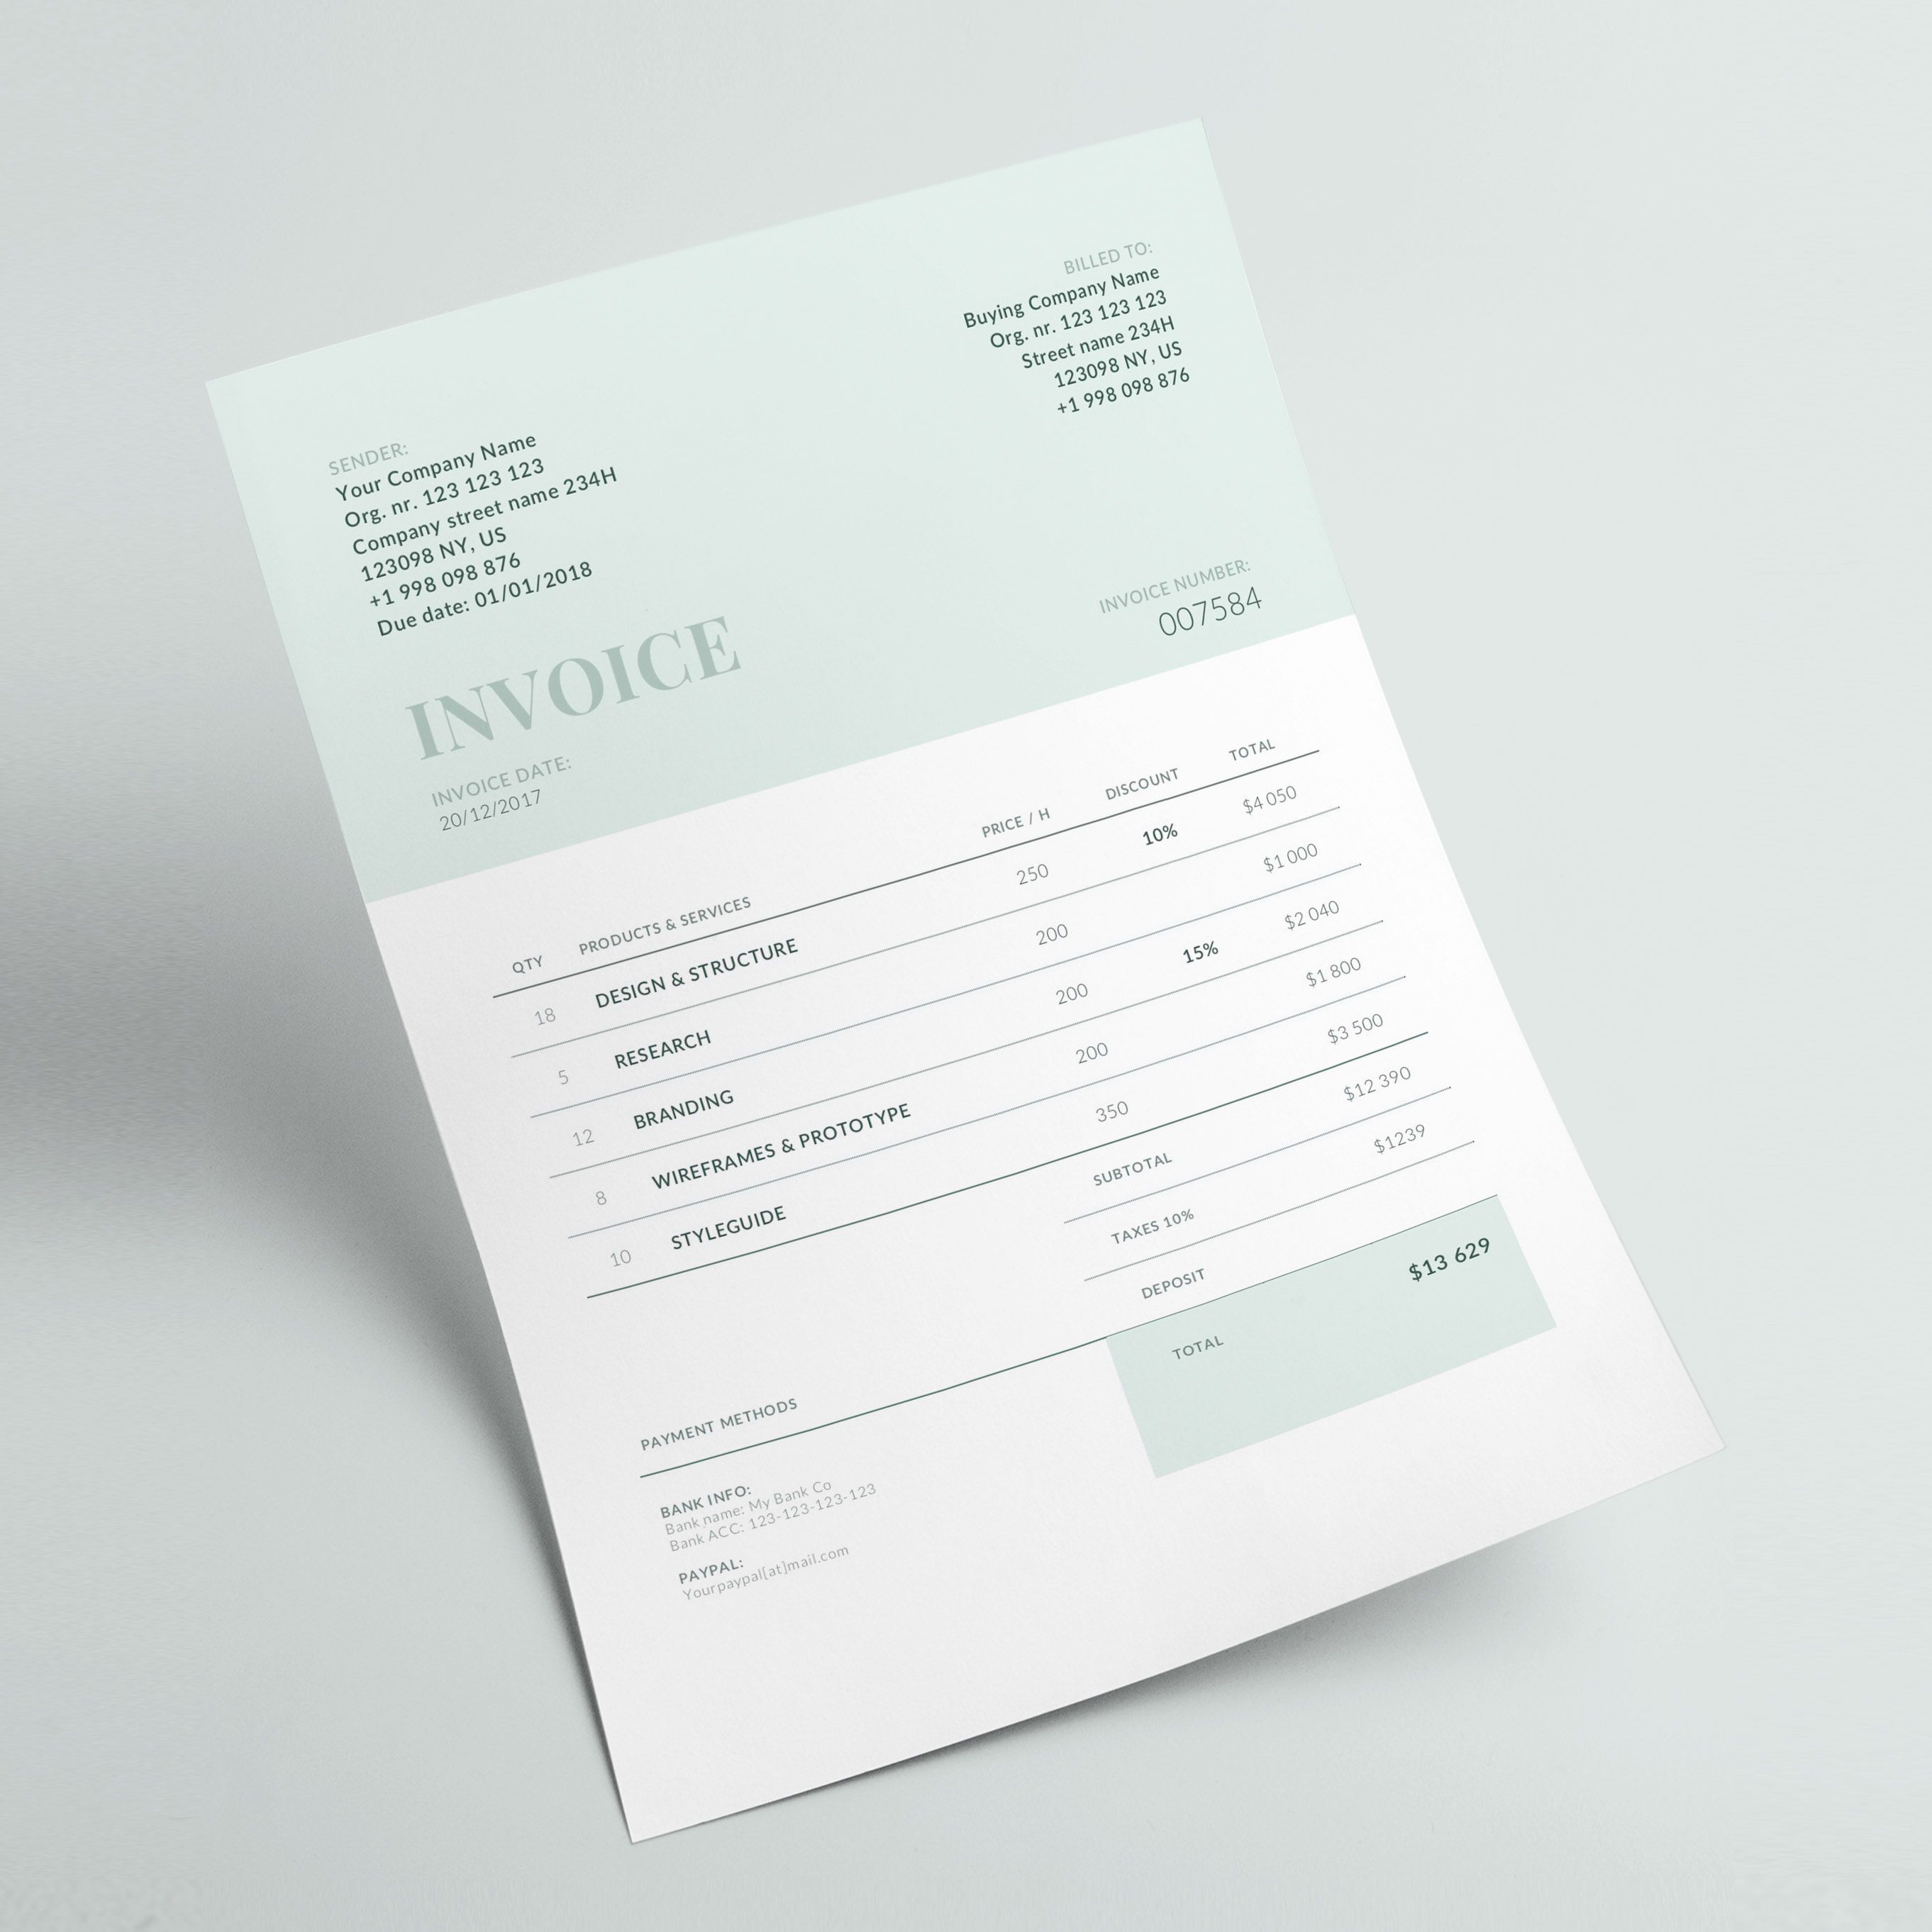 Dayoneresume Invoice Template Design Invoice Template Invoice Design Invoice Design Template